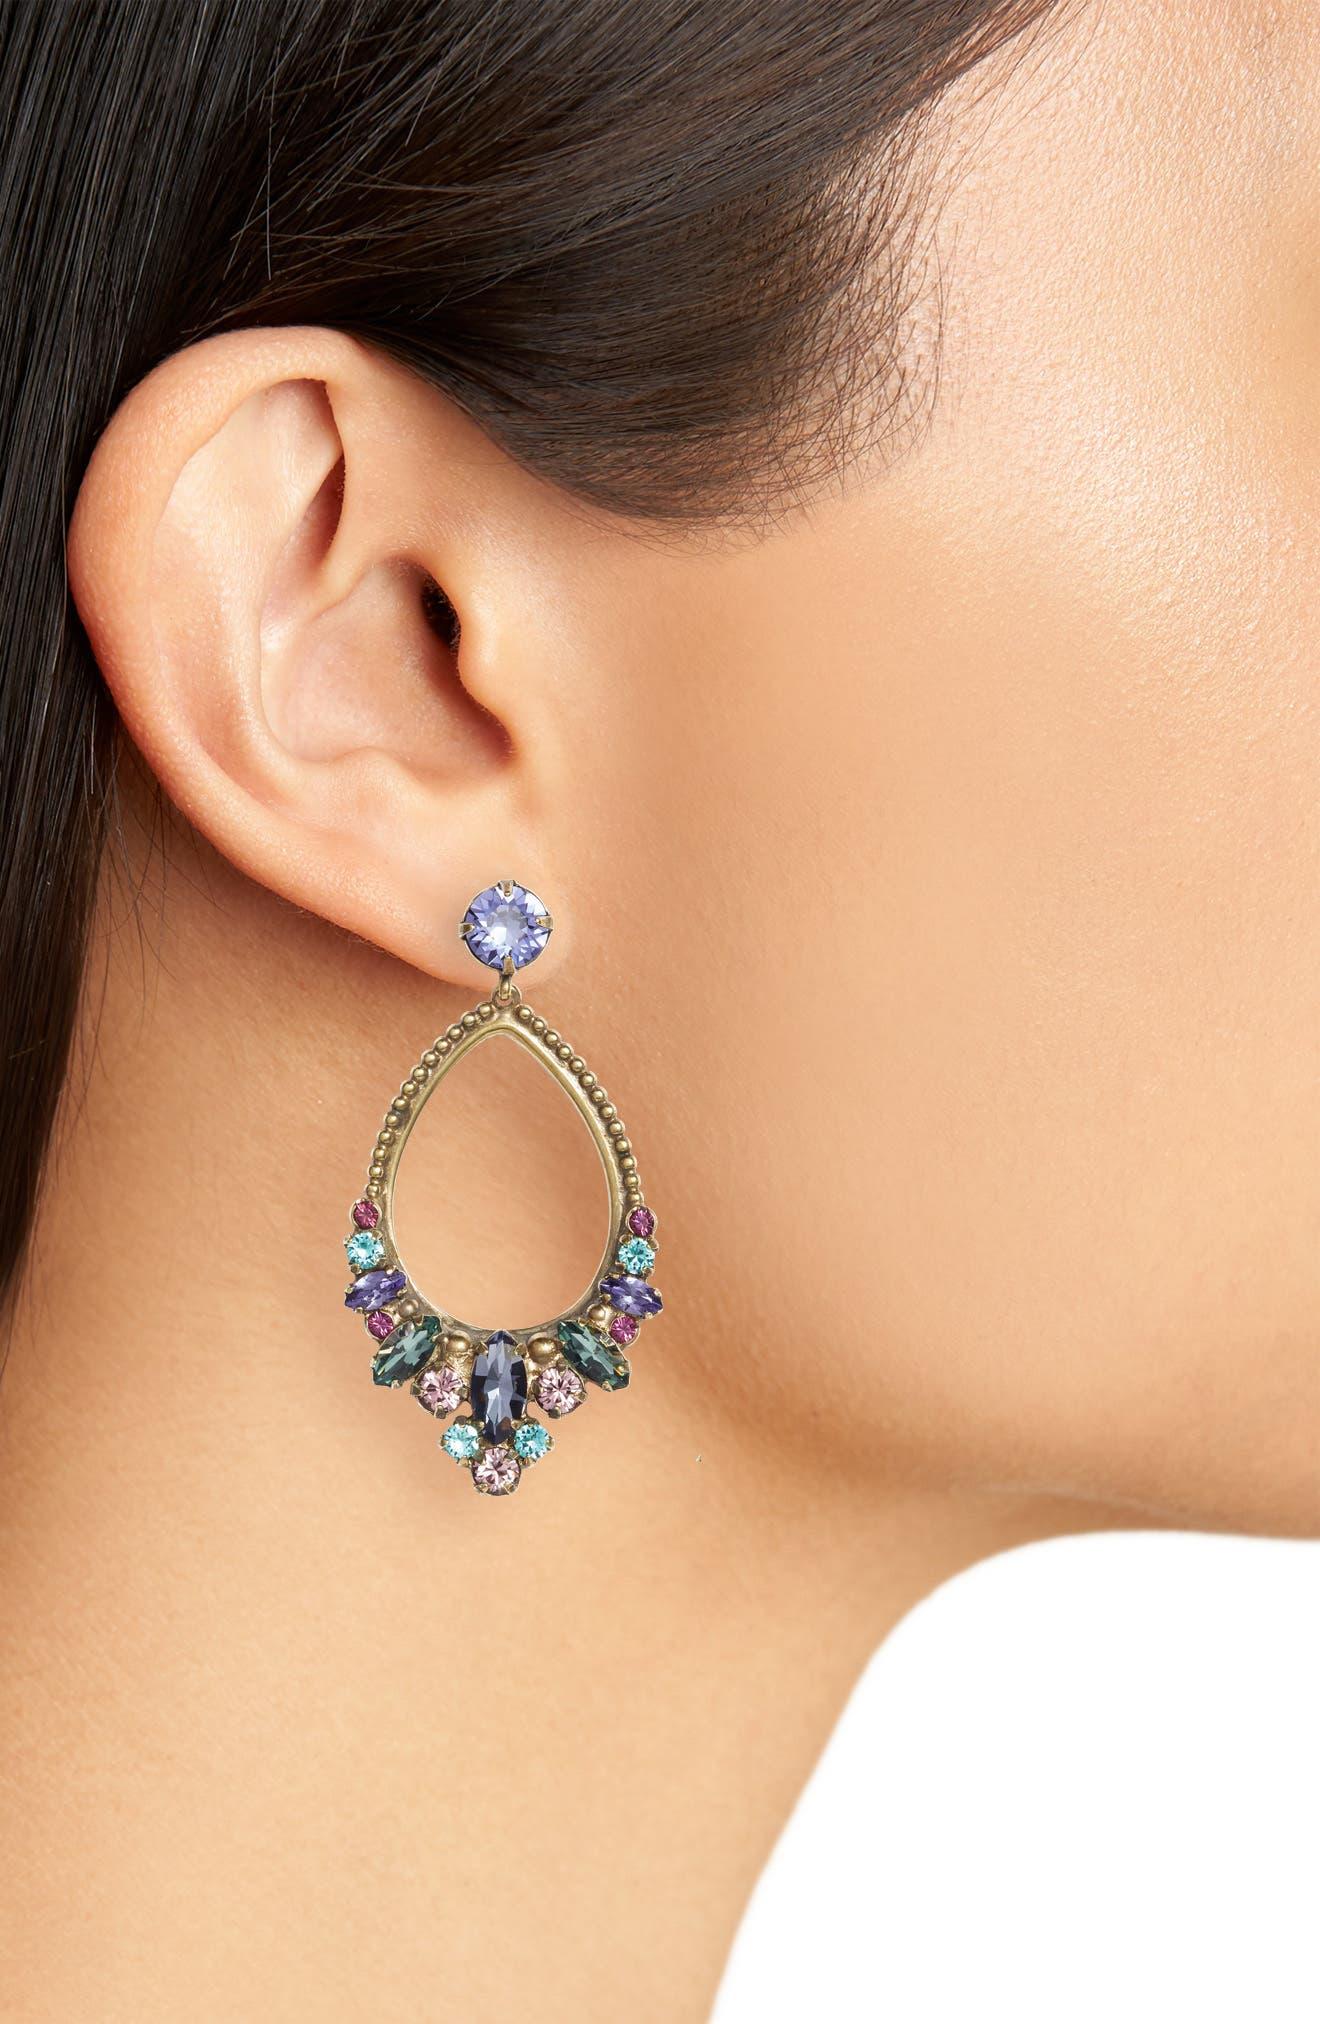 Noveau Navette Crystal Drop Earrings,                             Alternate thumbnail 2, color,